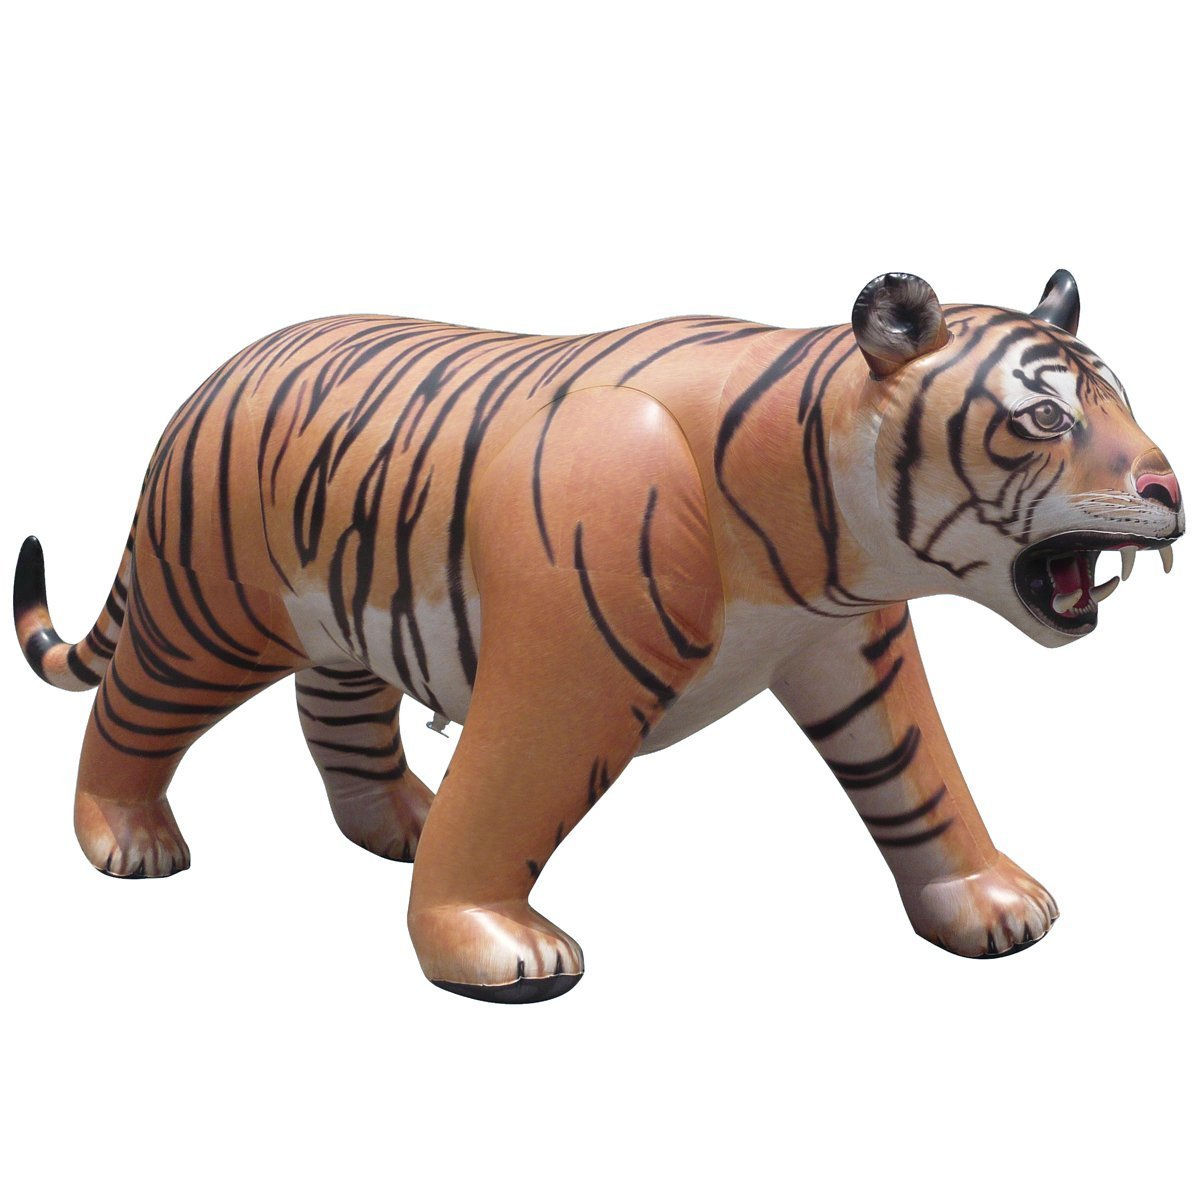 Amazon Jet Creations Inflatable Zebra 32 Inch Toys Games